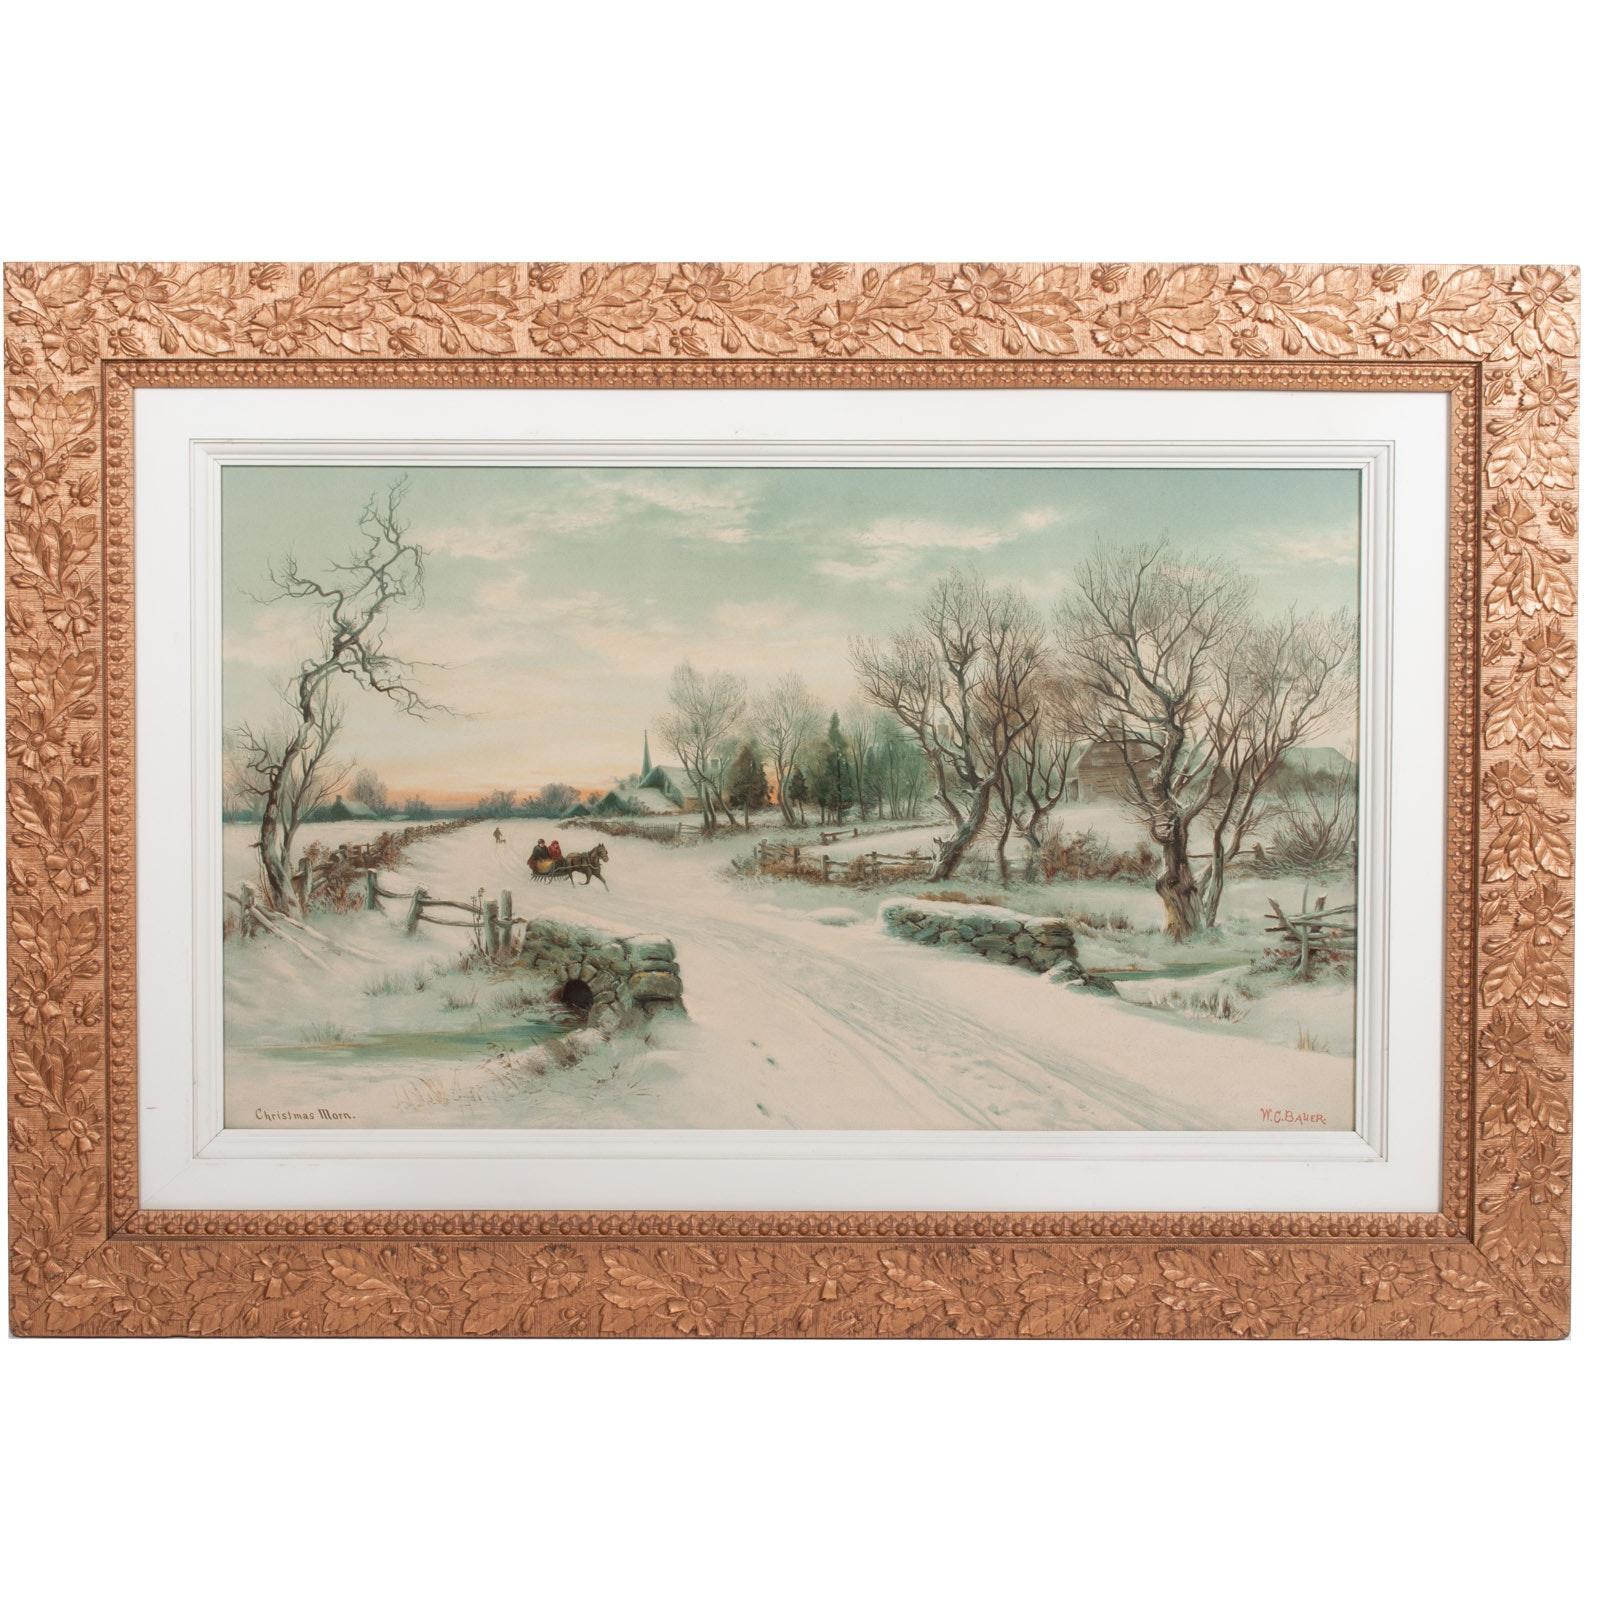 "W.C. Bauer Lithograph ""Christmas Morn"""